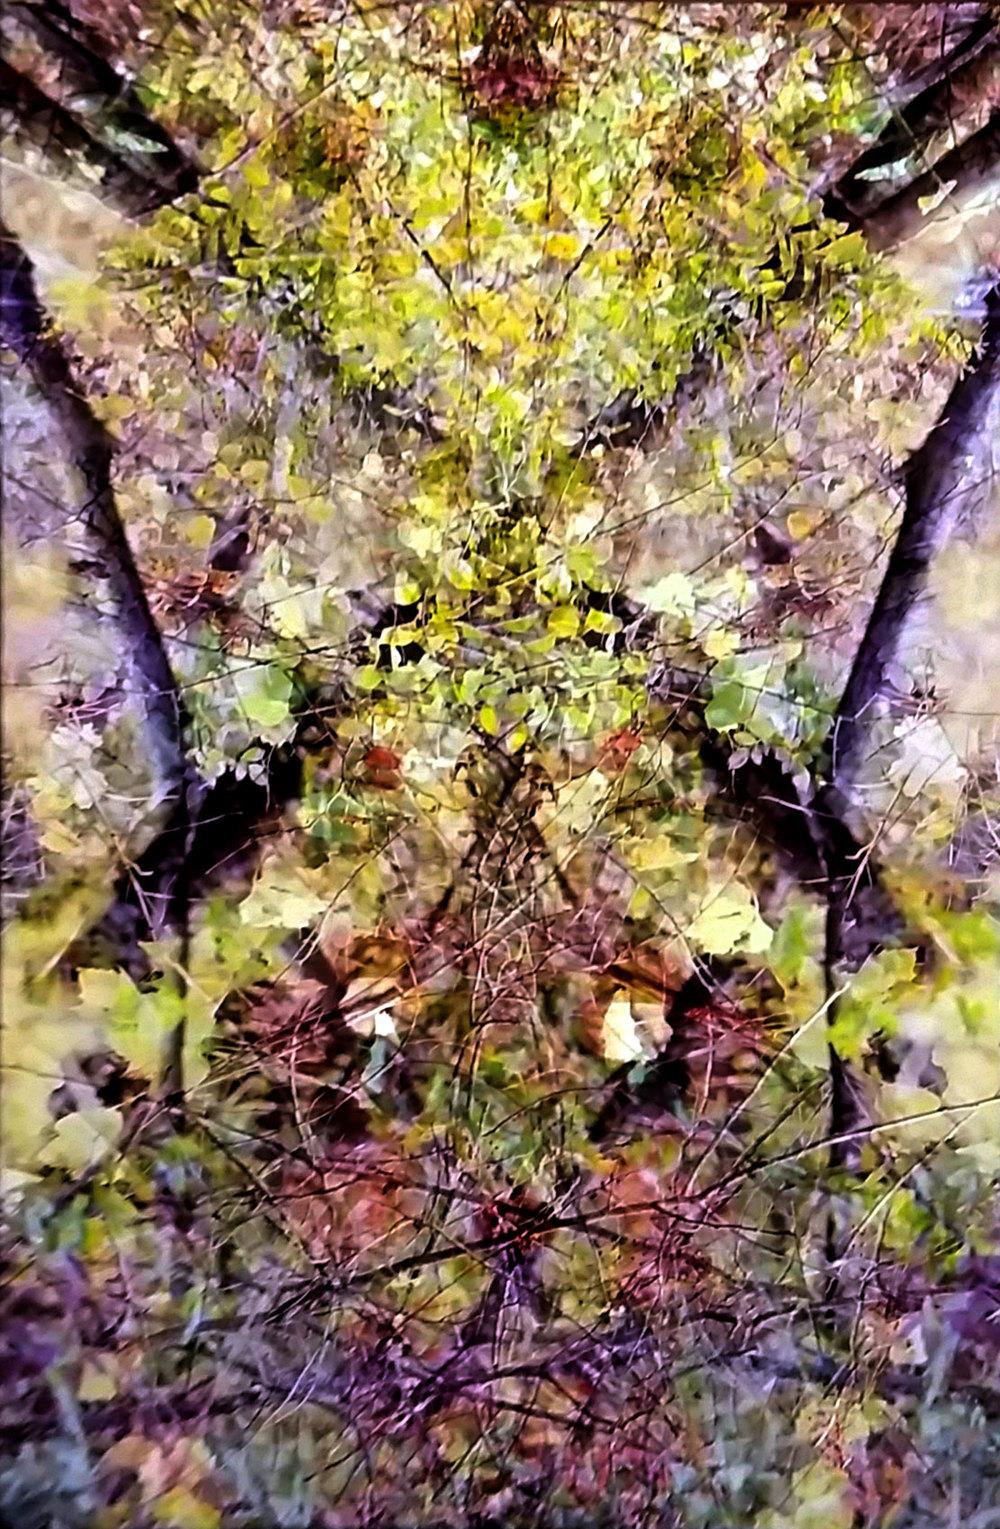 © 2015 Diane Ronayne, Angry Rabbit